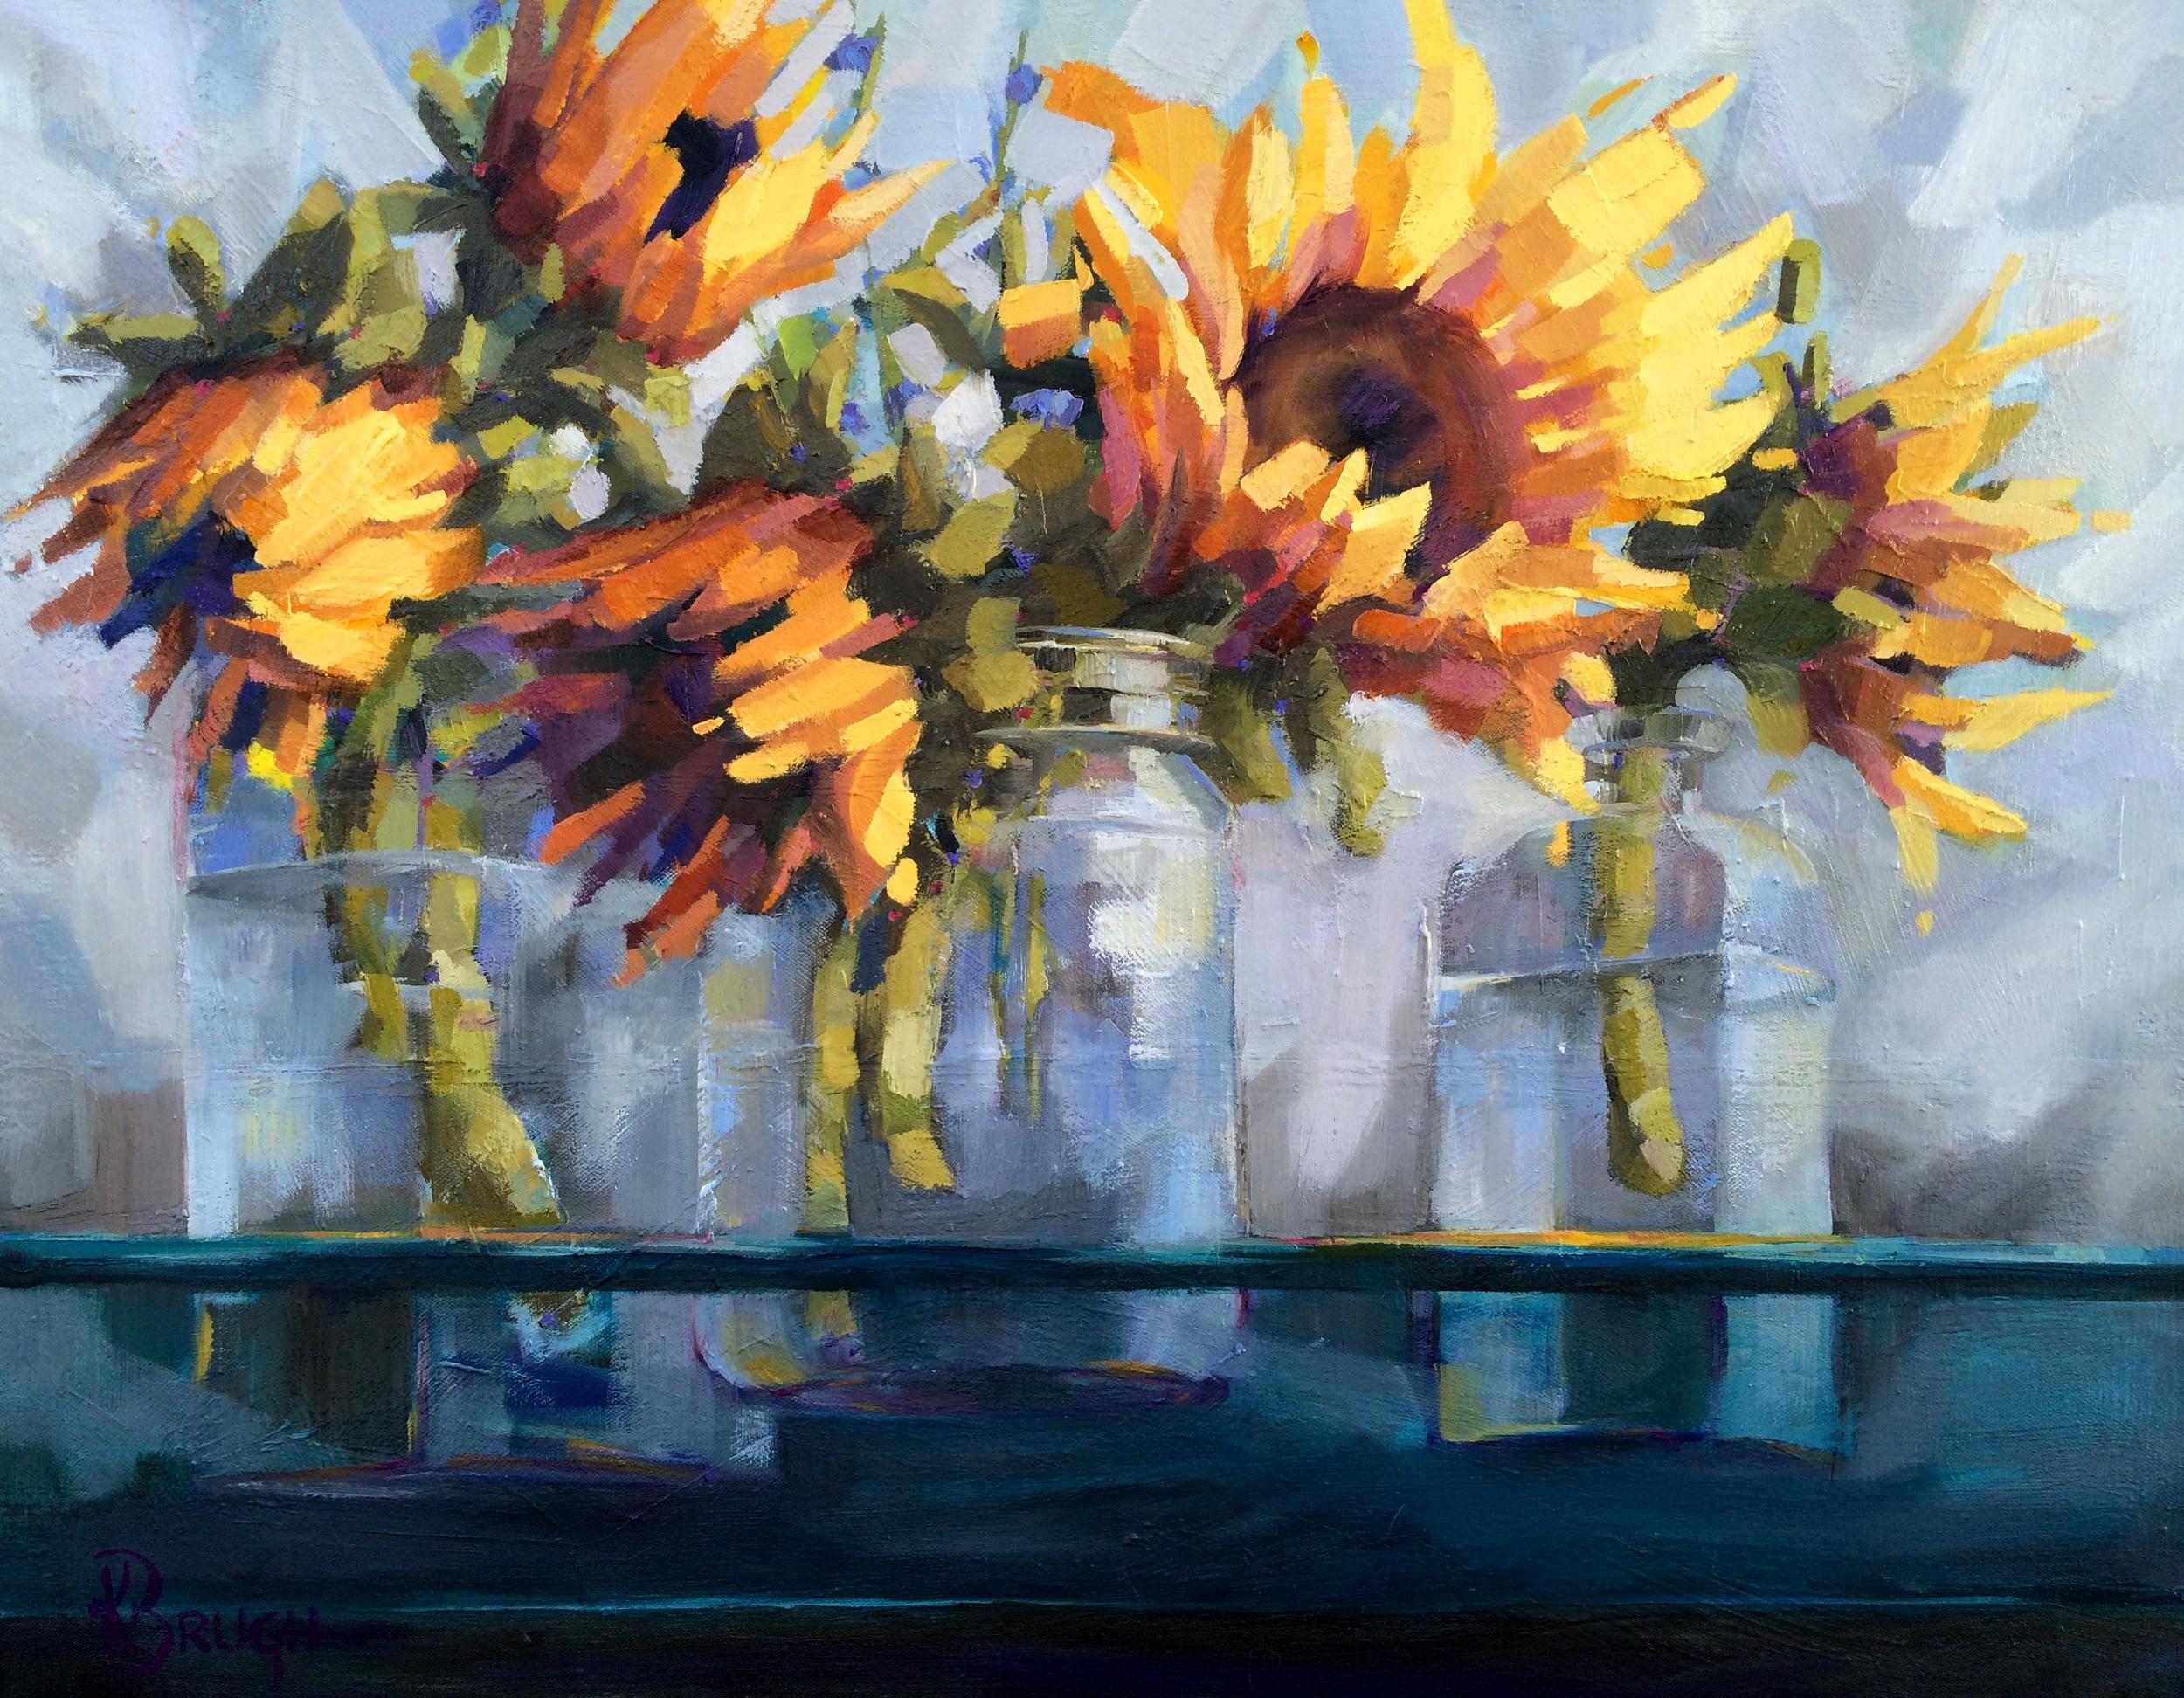 Kelley Brugh_Dazzling Display_24x30, Oil on canvas.JPG